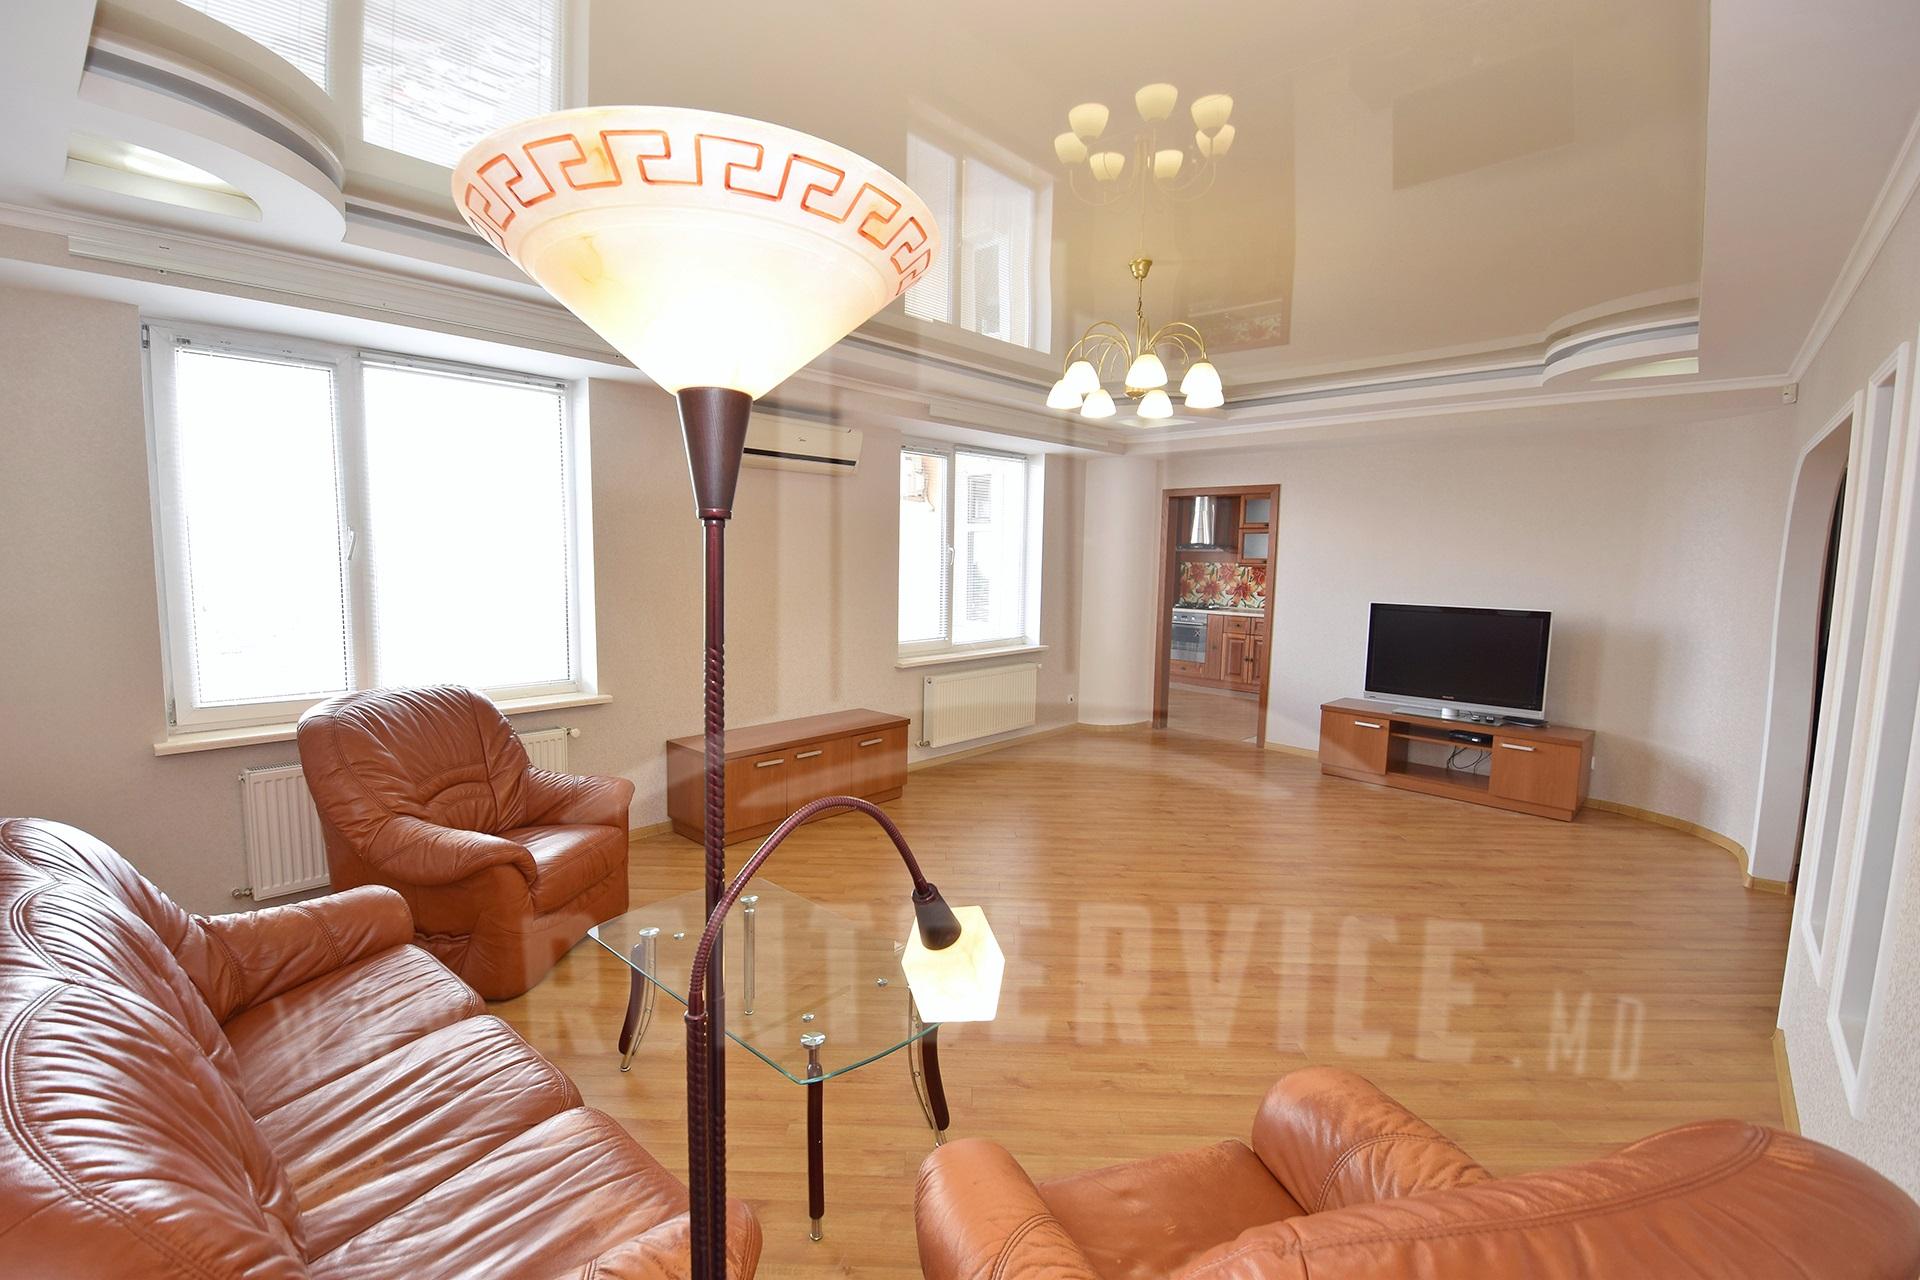 211_apartment_1.JPG